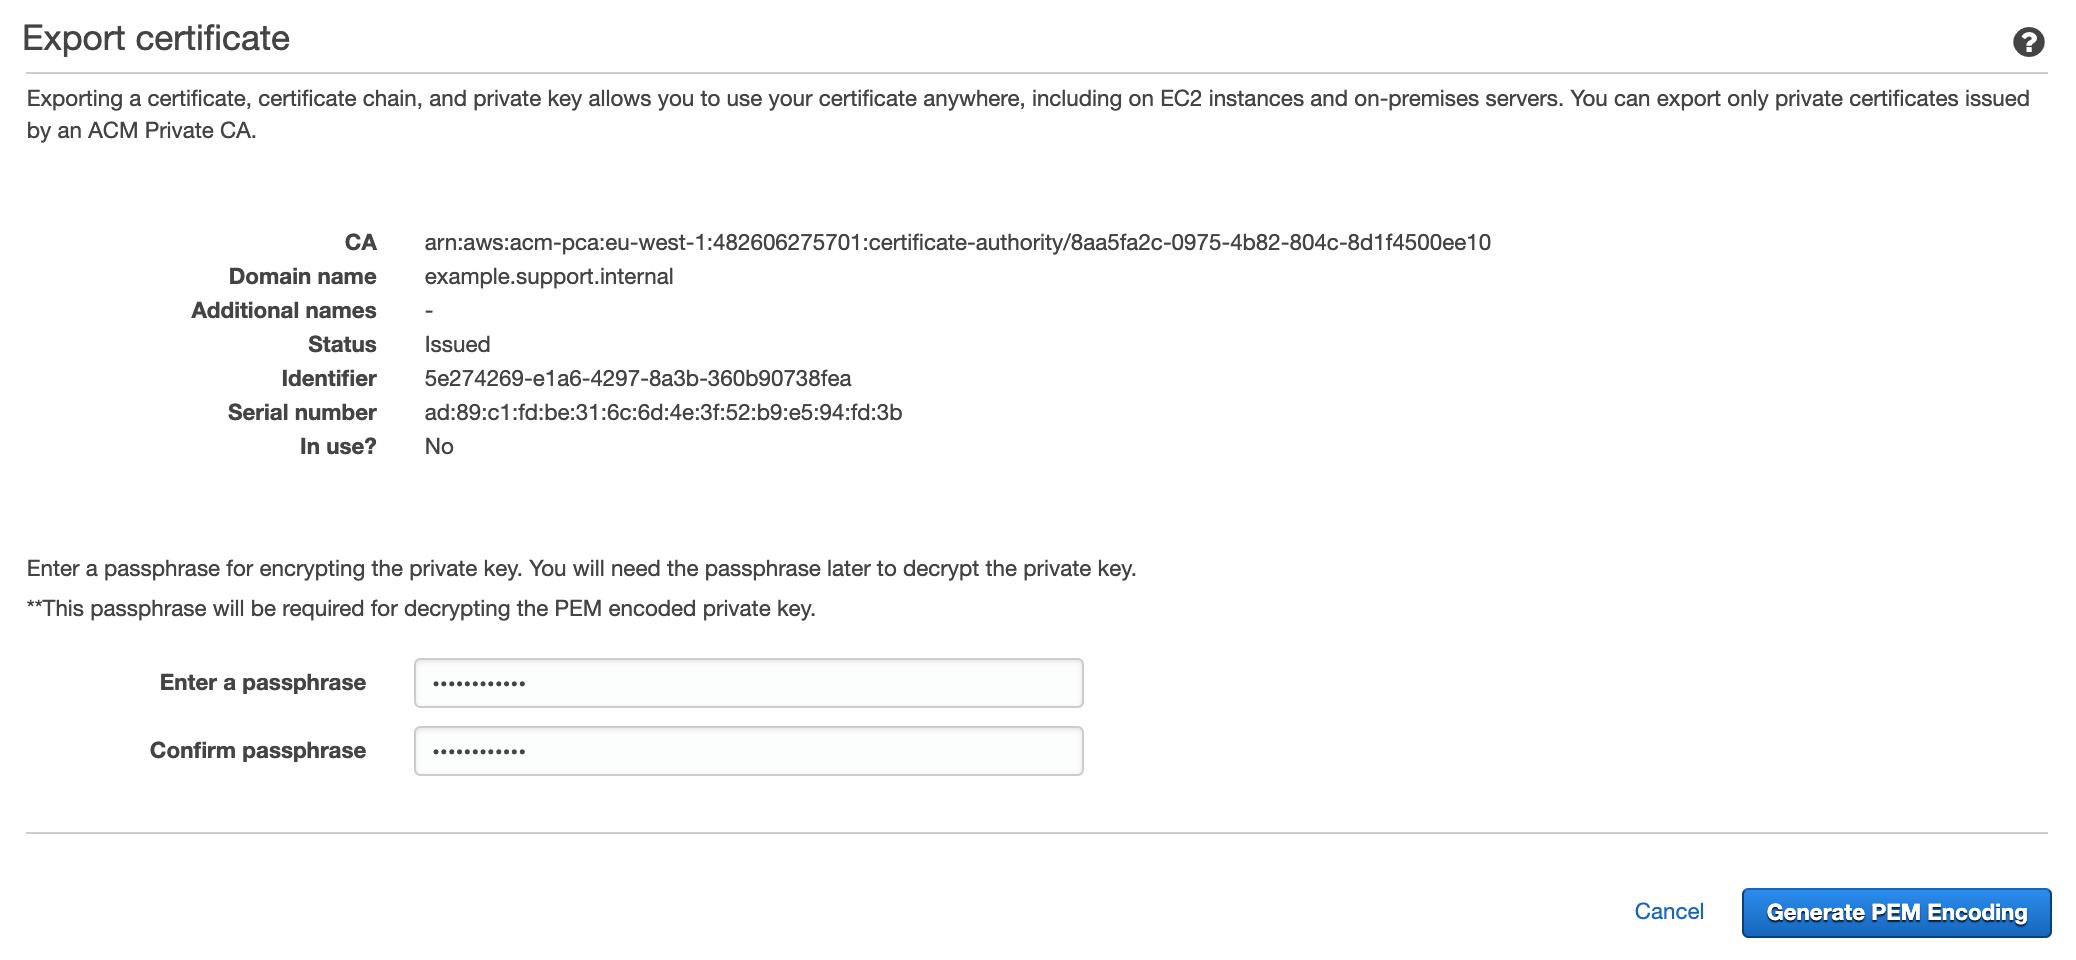 Figure 8: Export certificate page